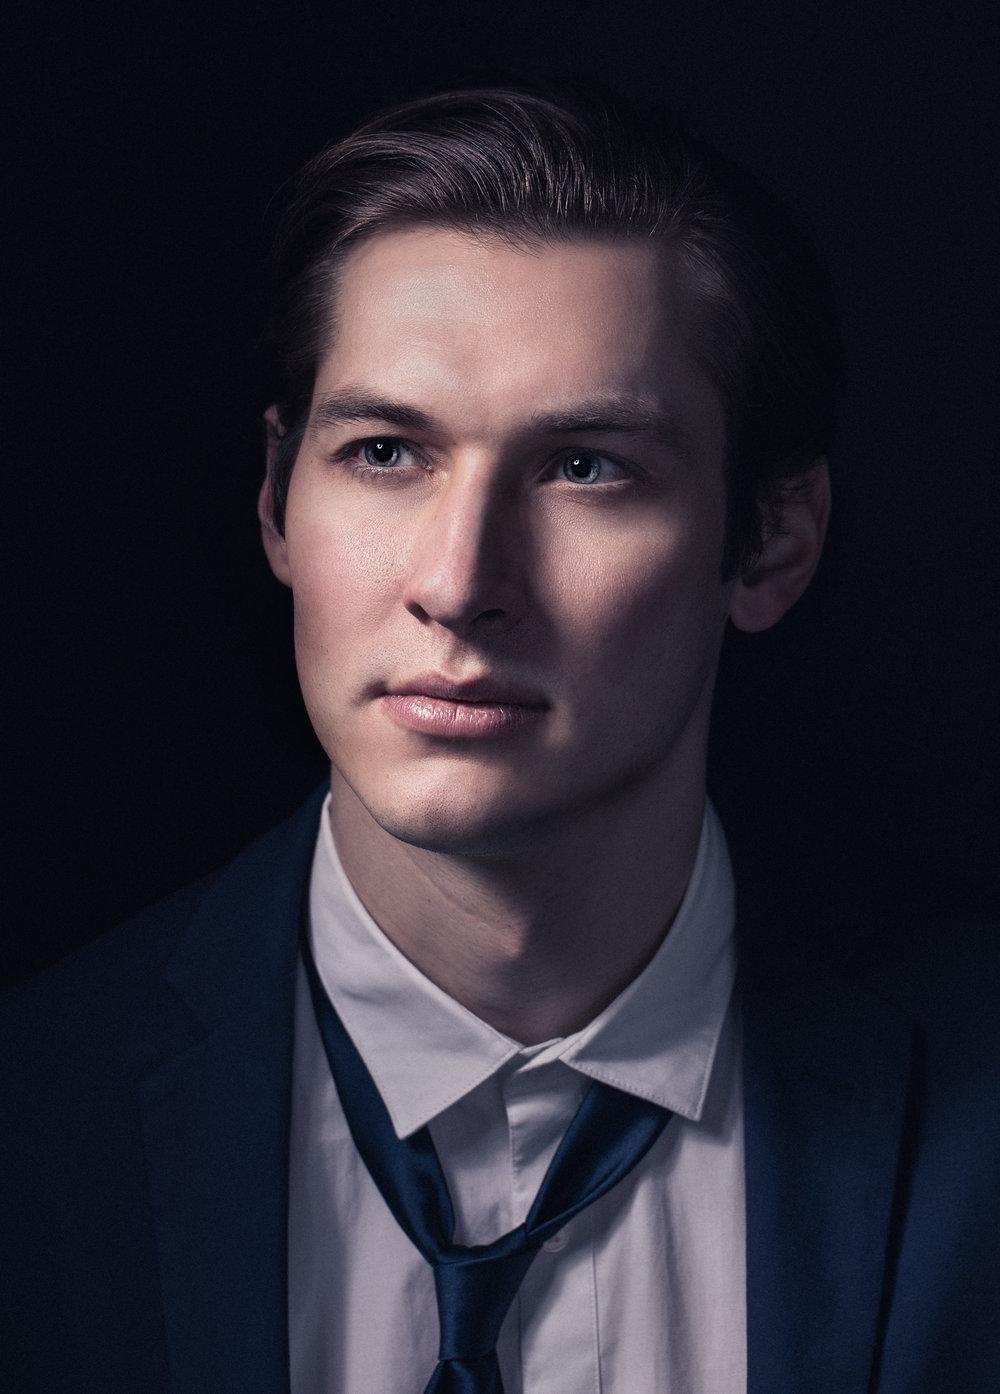 Erik-Sven-commercial-portrait.jpg